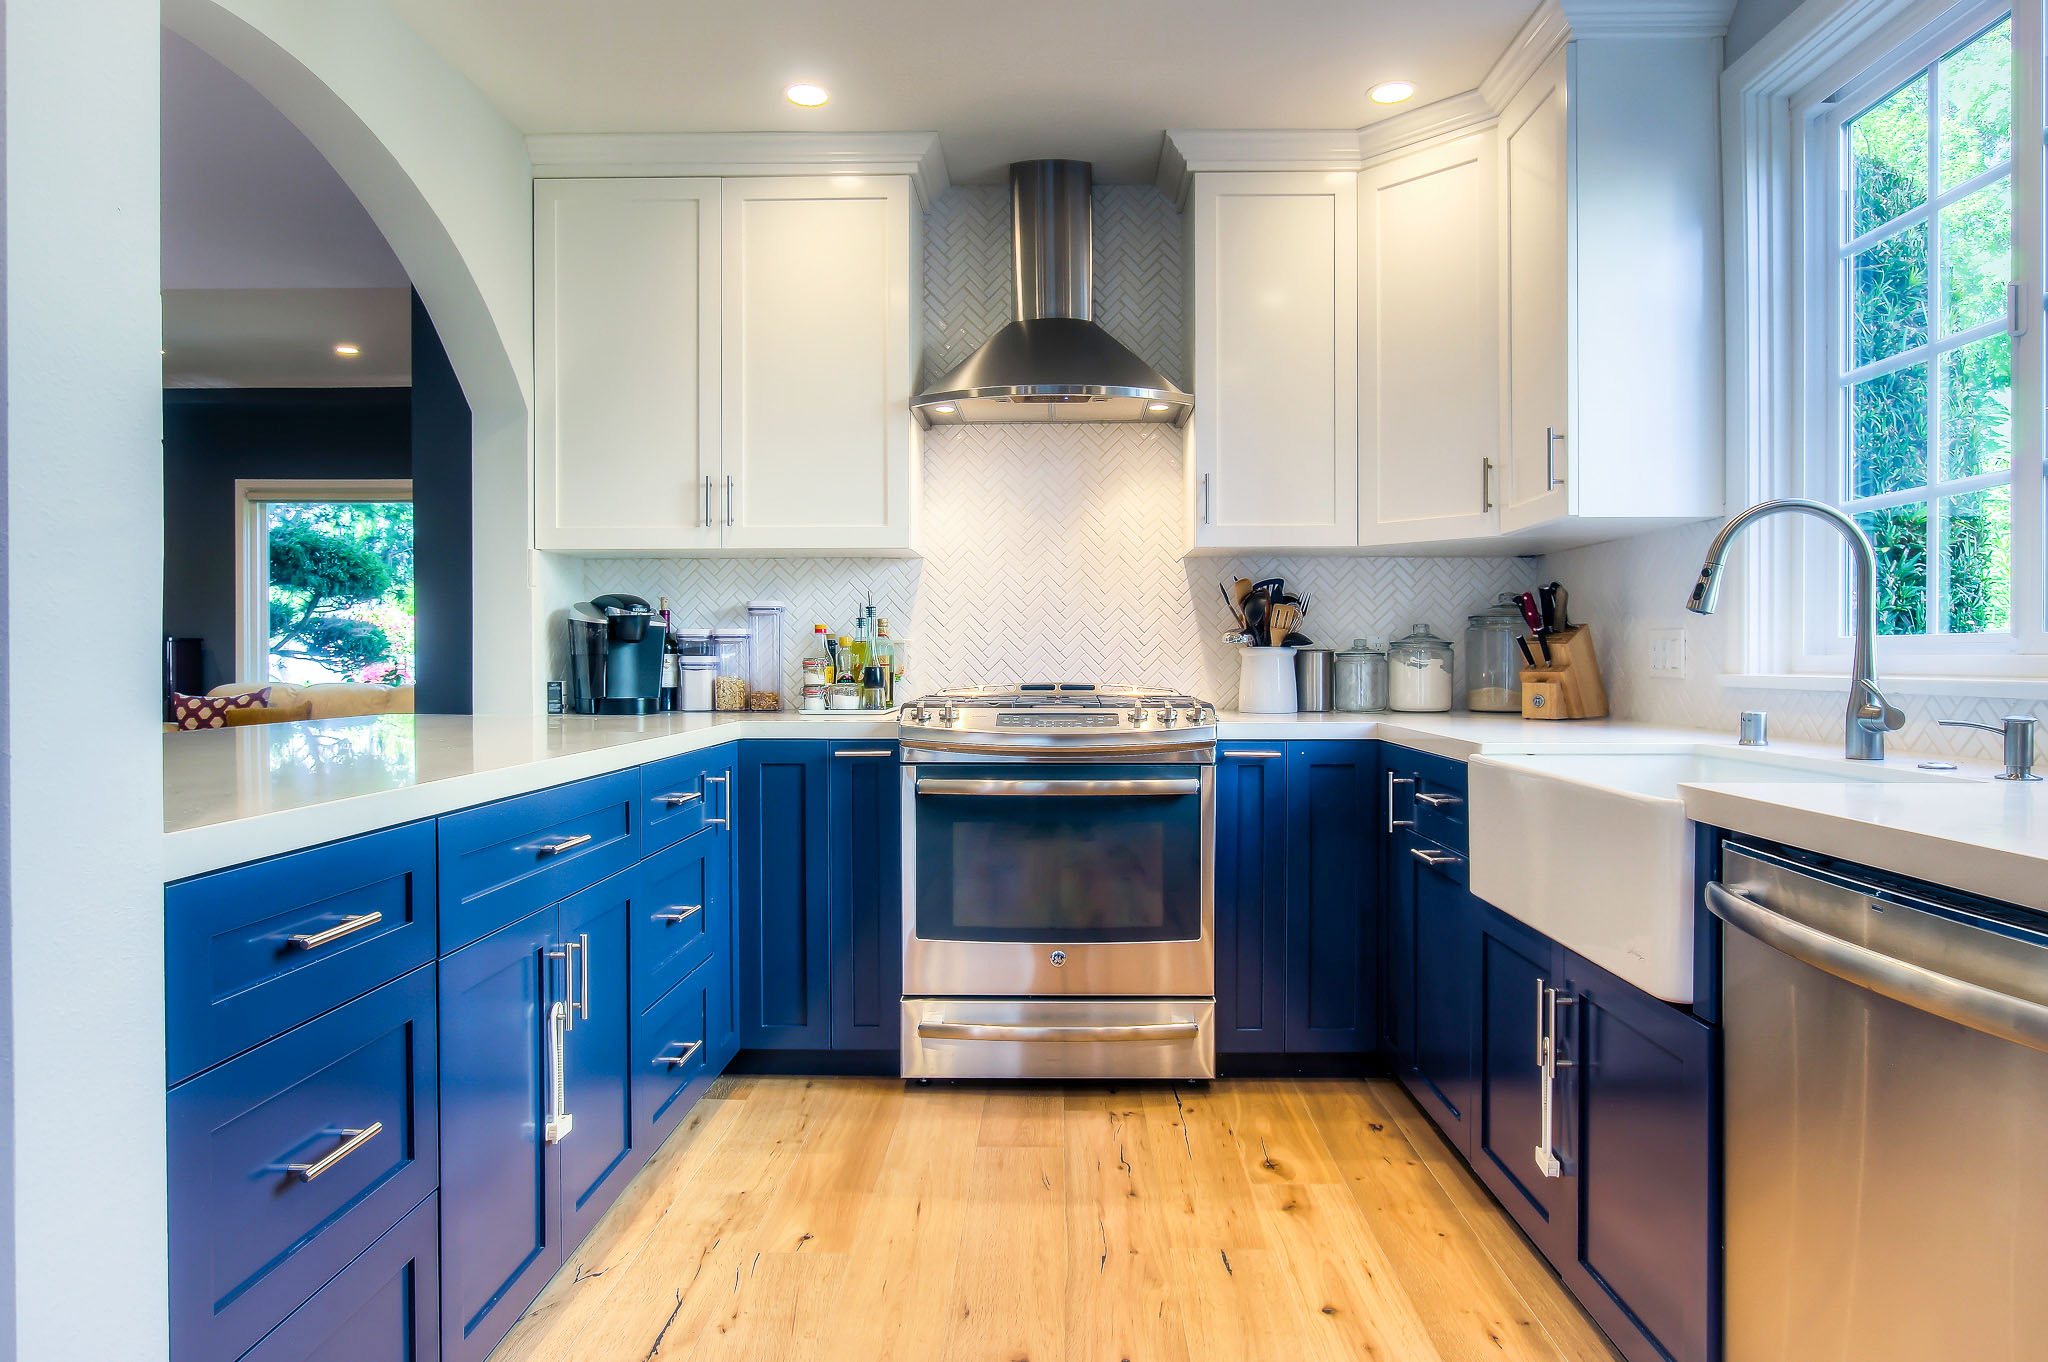 Culver City kitchen remodel